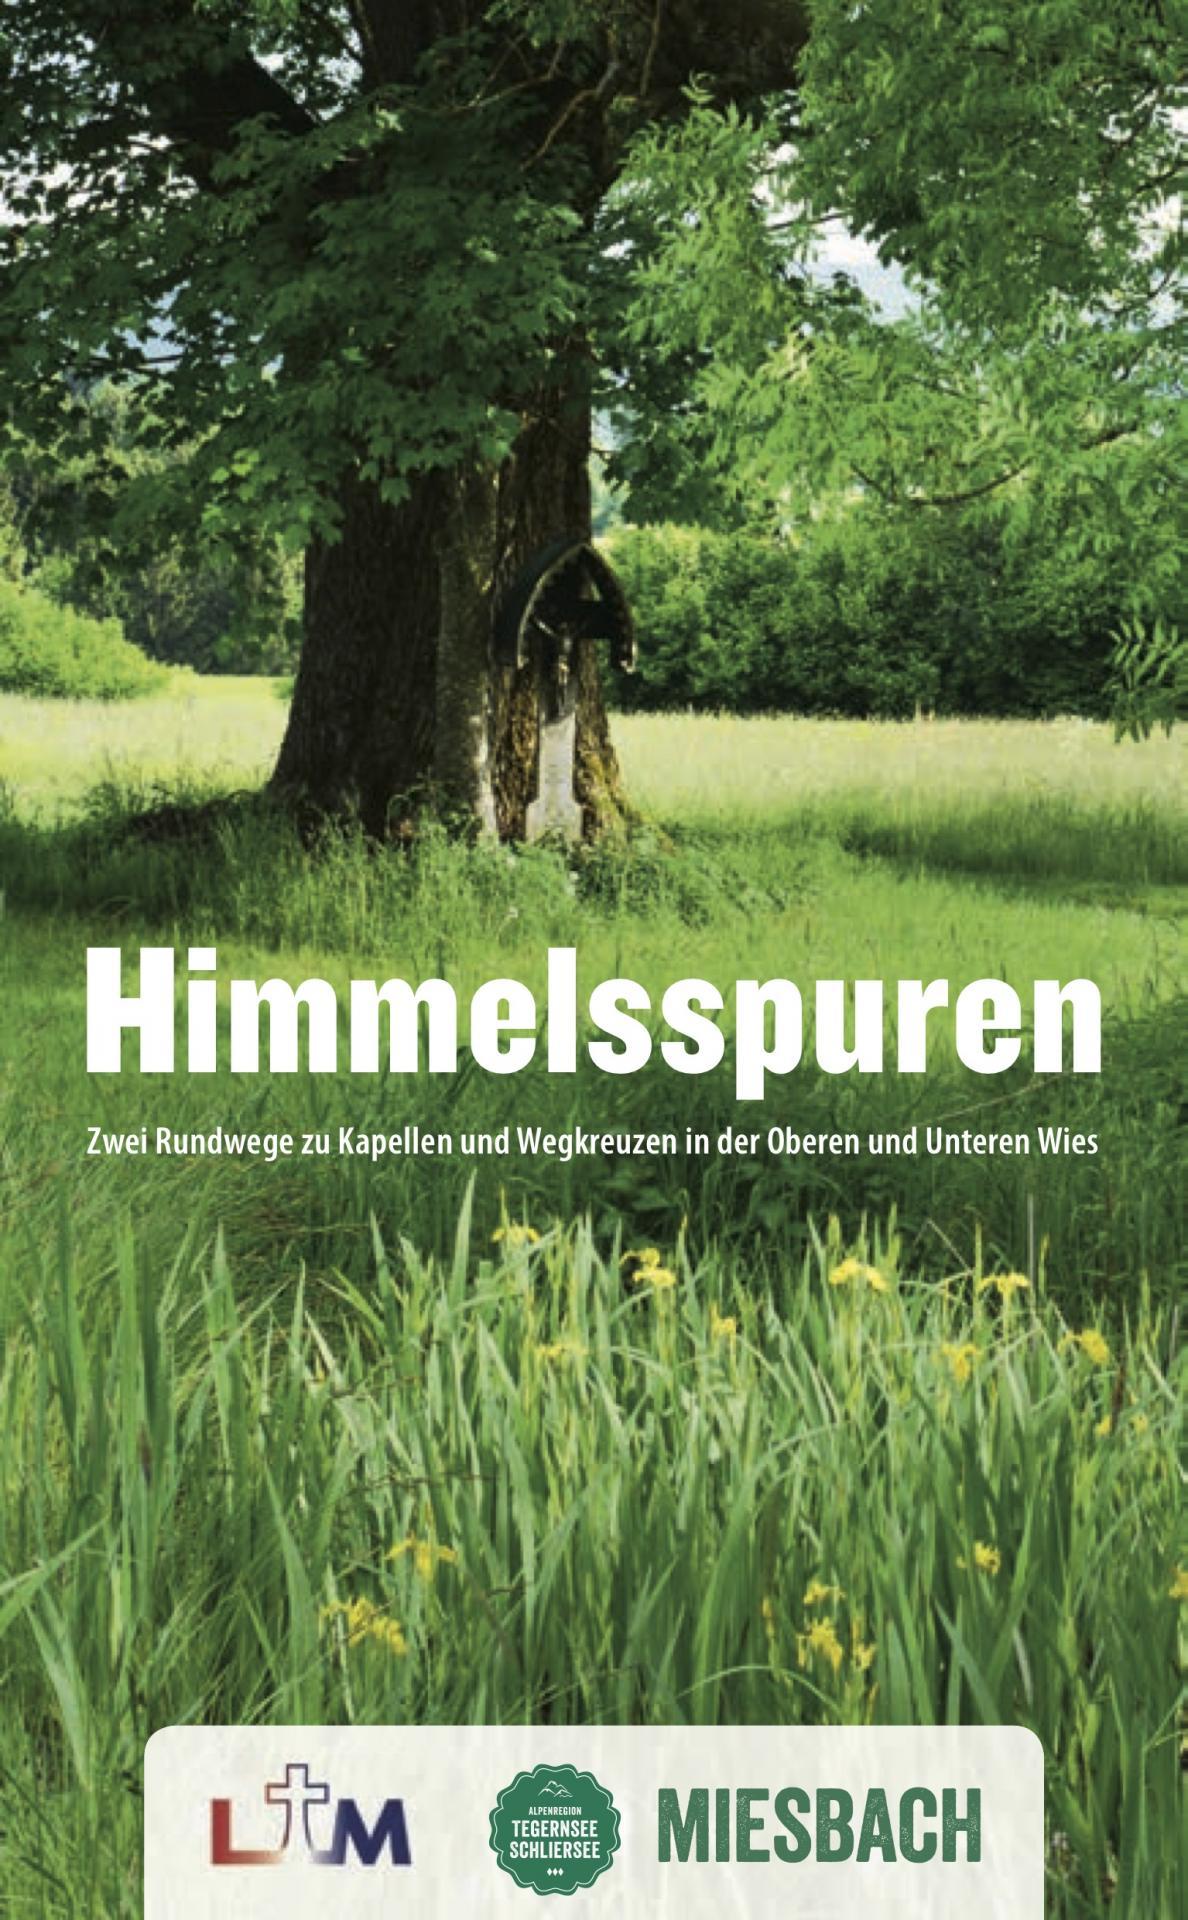 Kapellenweg-Text